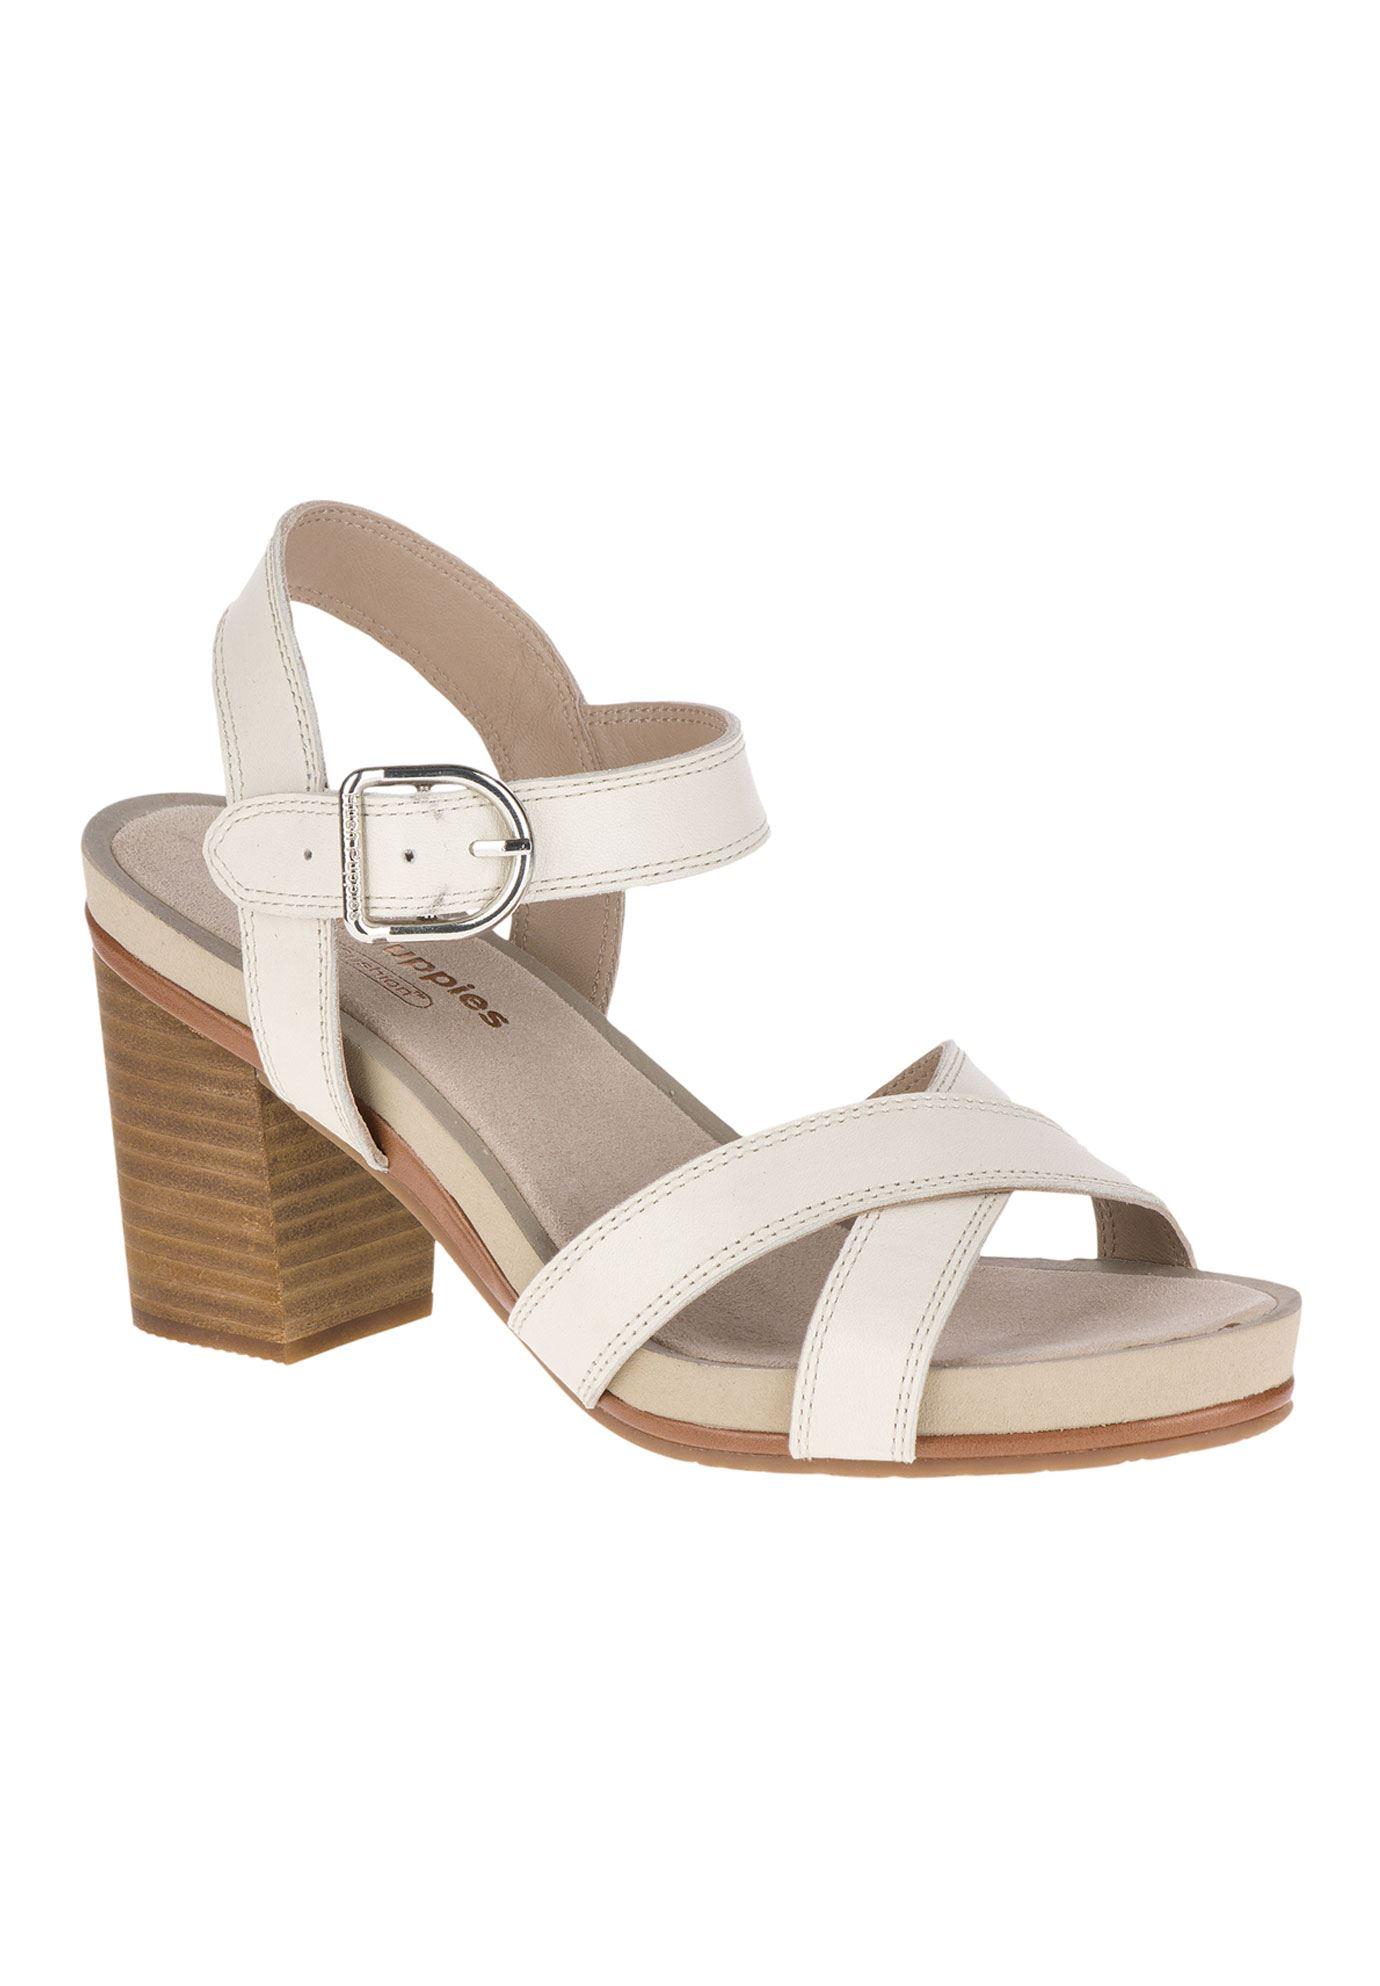 adc1b3c6353 Mariska Buckle Qtr Sandals by Hush Puppies - Women's Plus Size ...